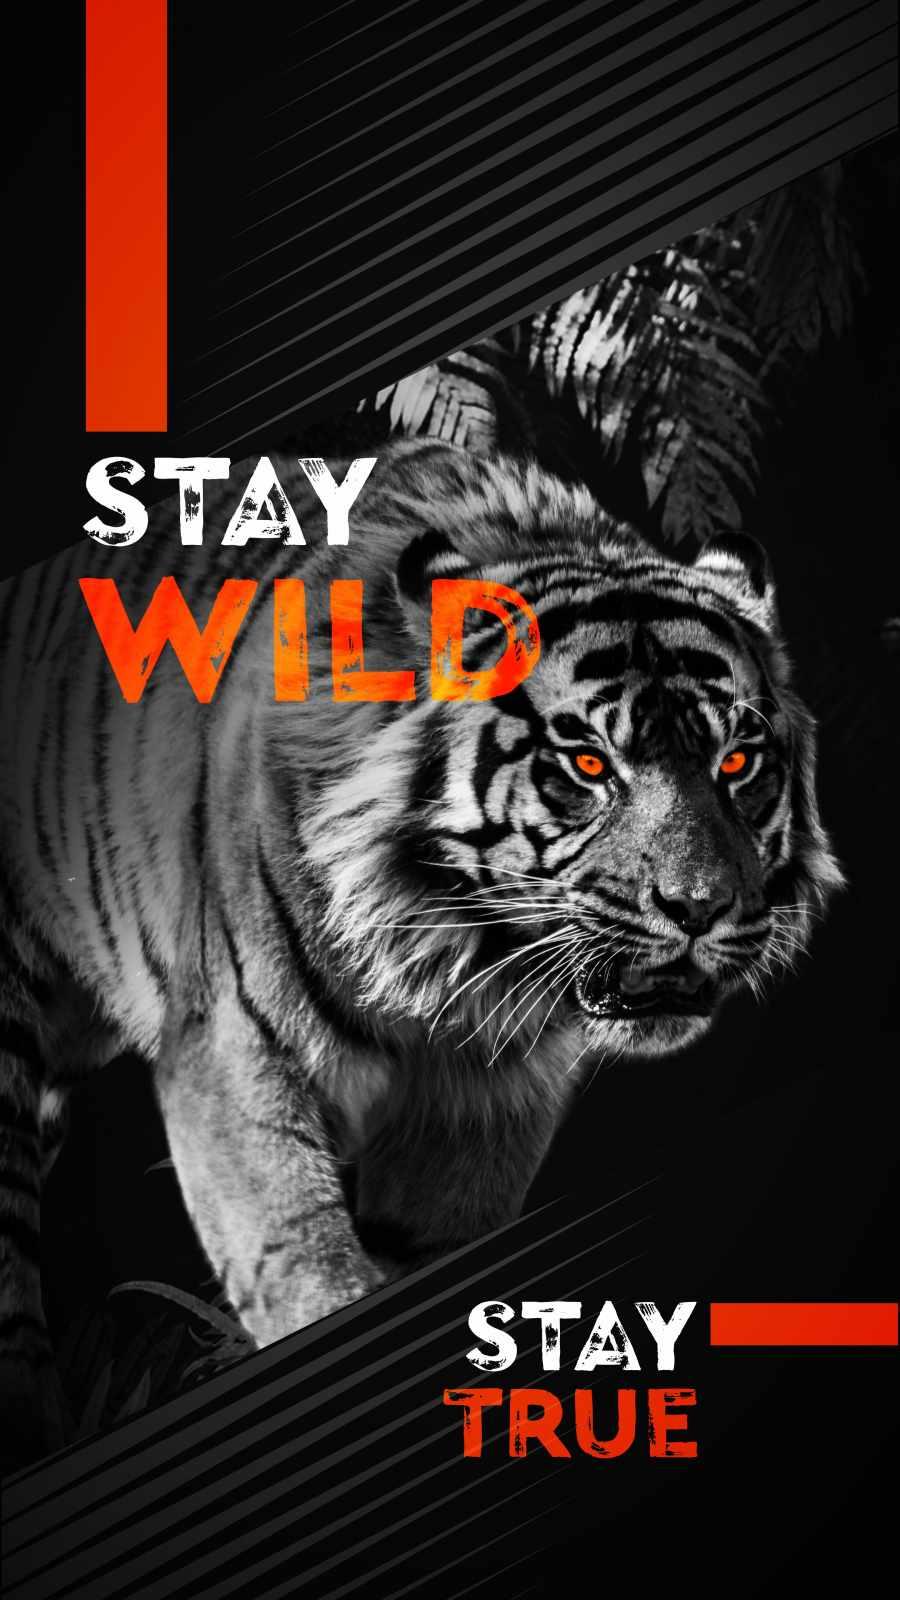 Stay Wild Stay True